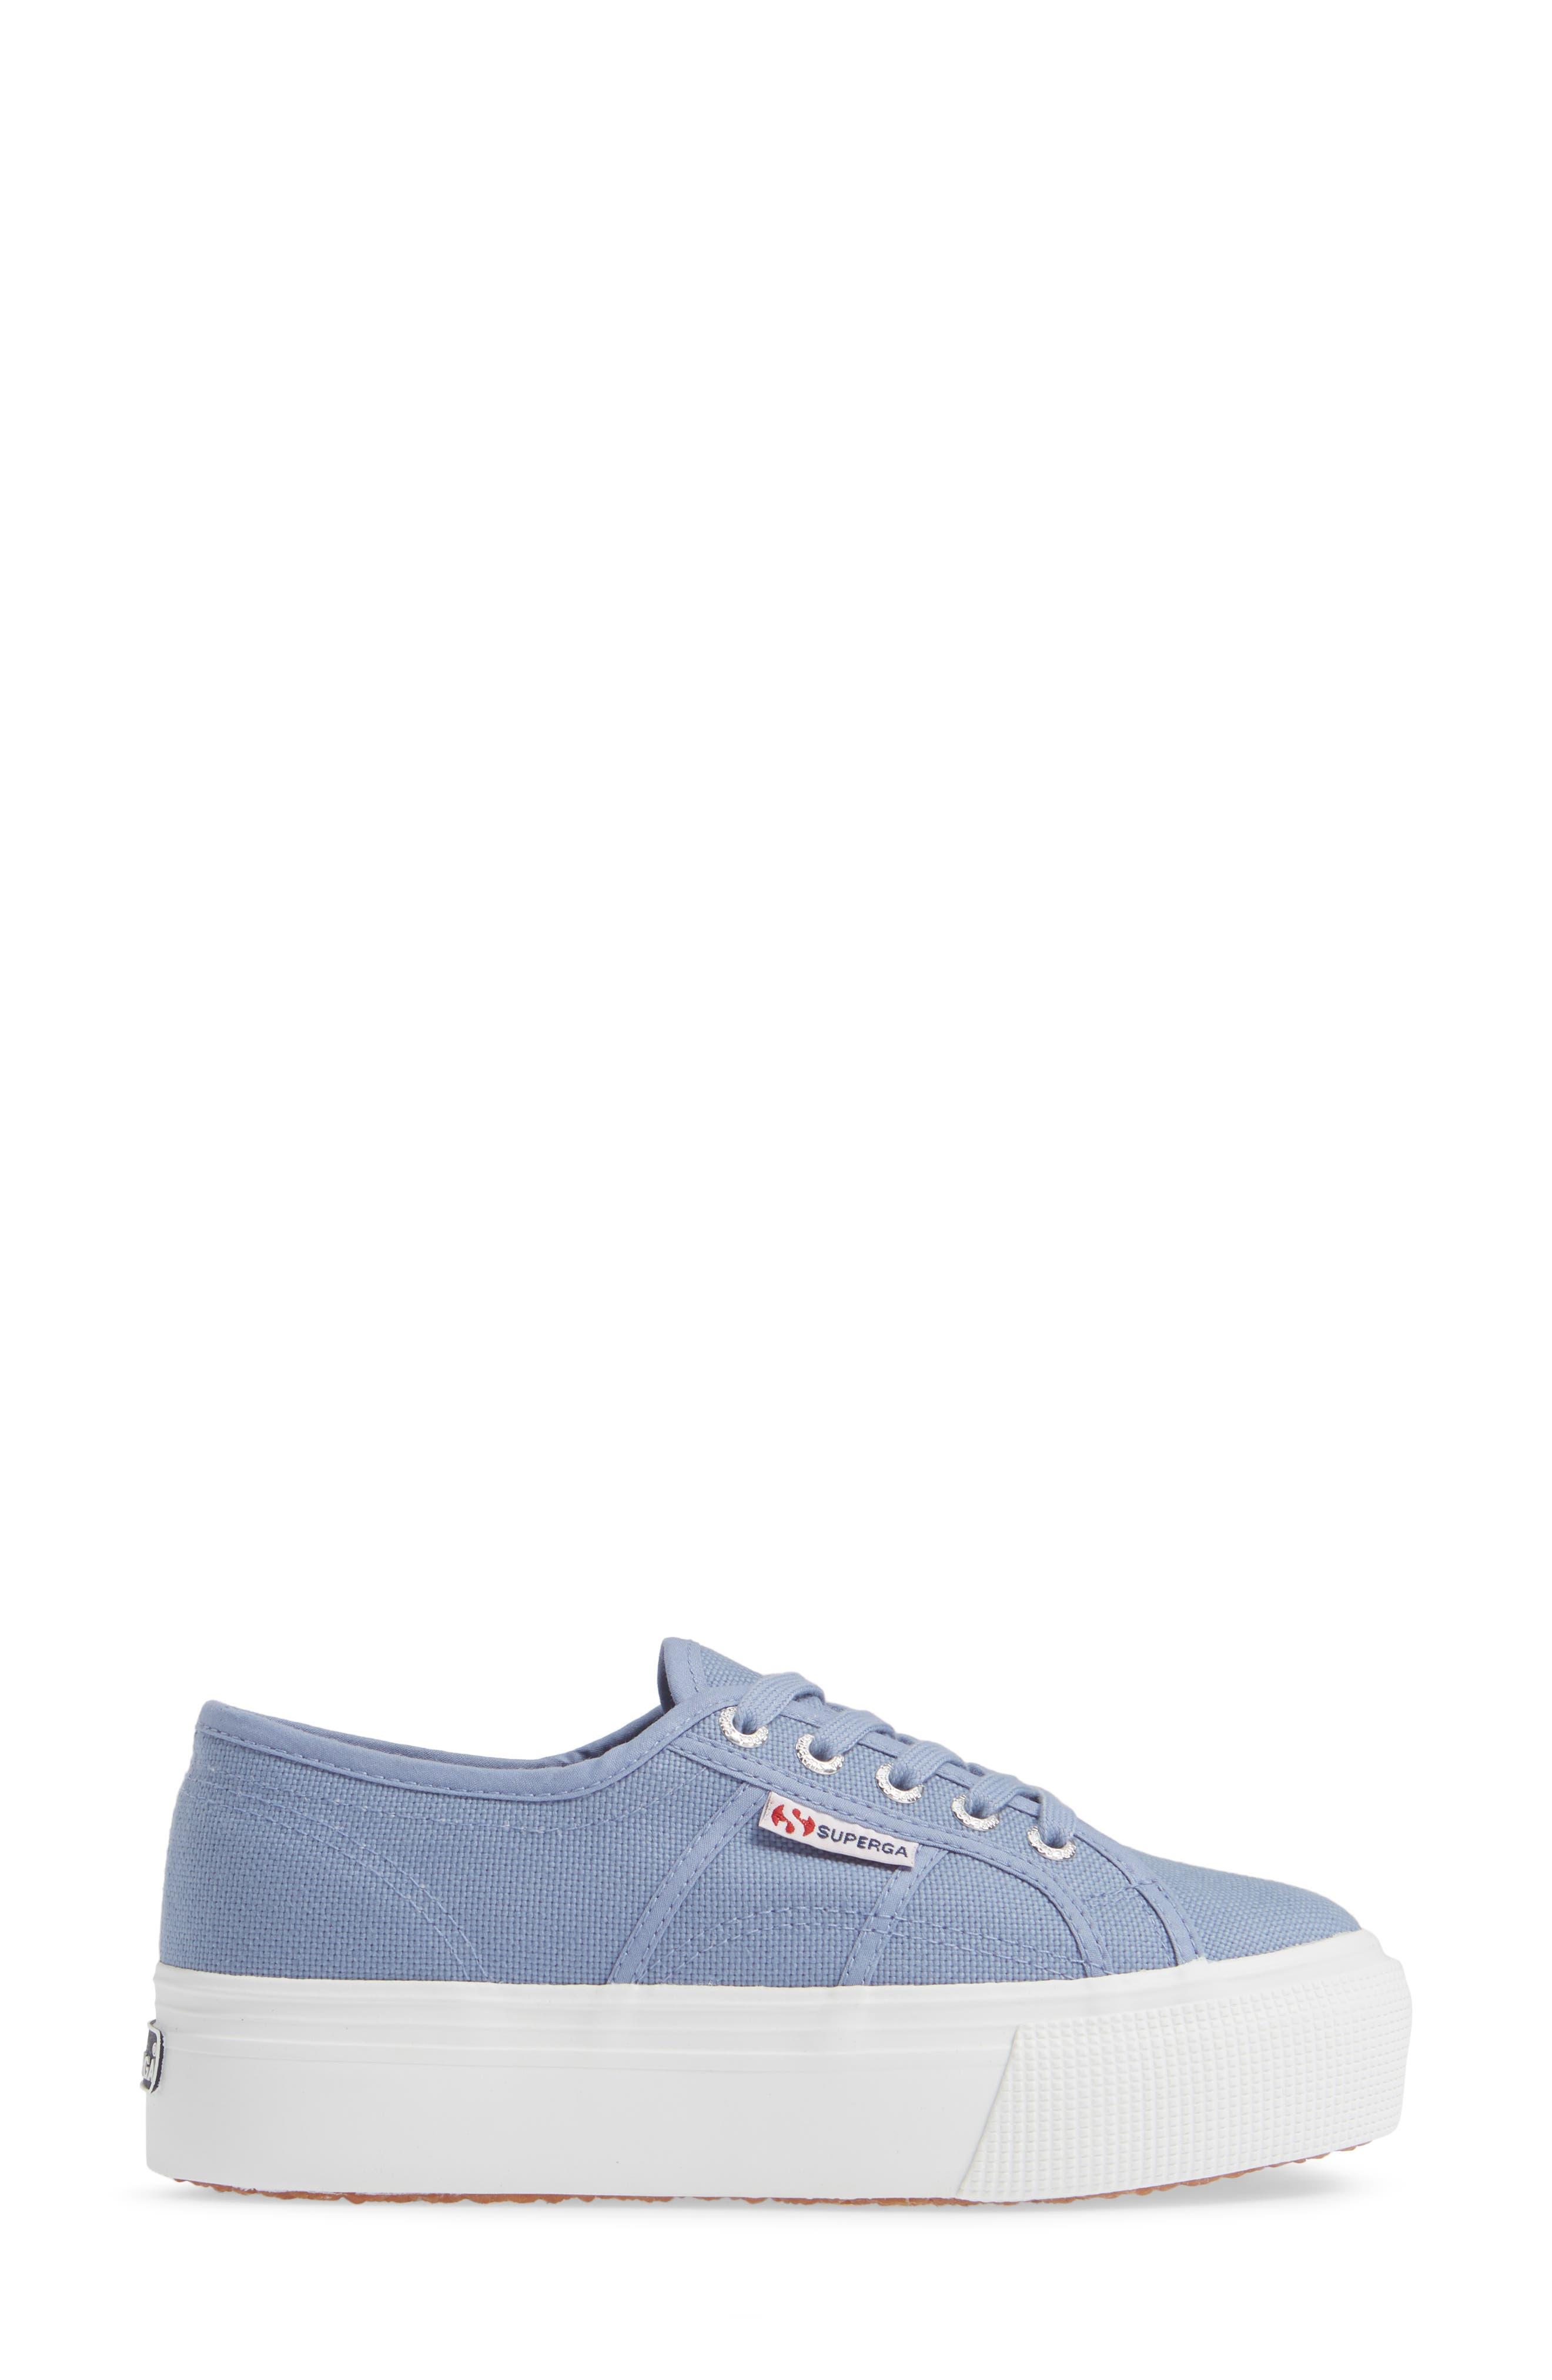 'Acot Linea' Sneaker,                             Alternate thumbnail 3, color,                             BLUE/ LIGHT PURPLE